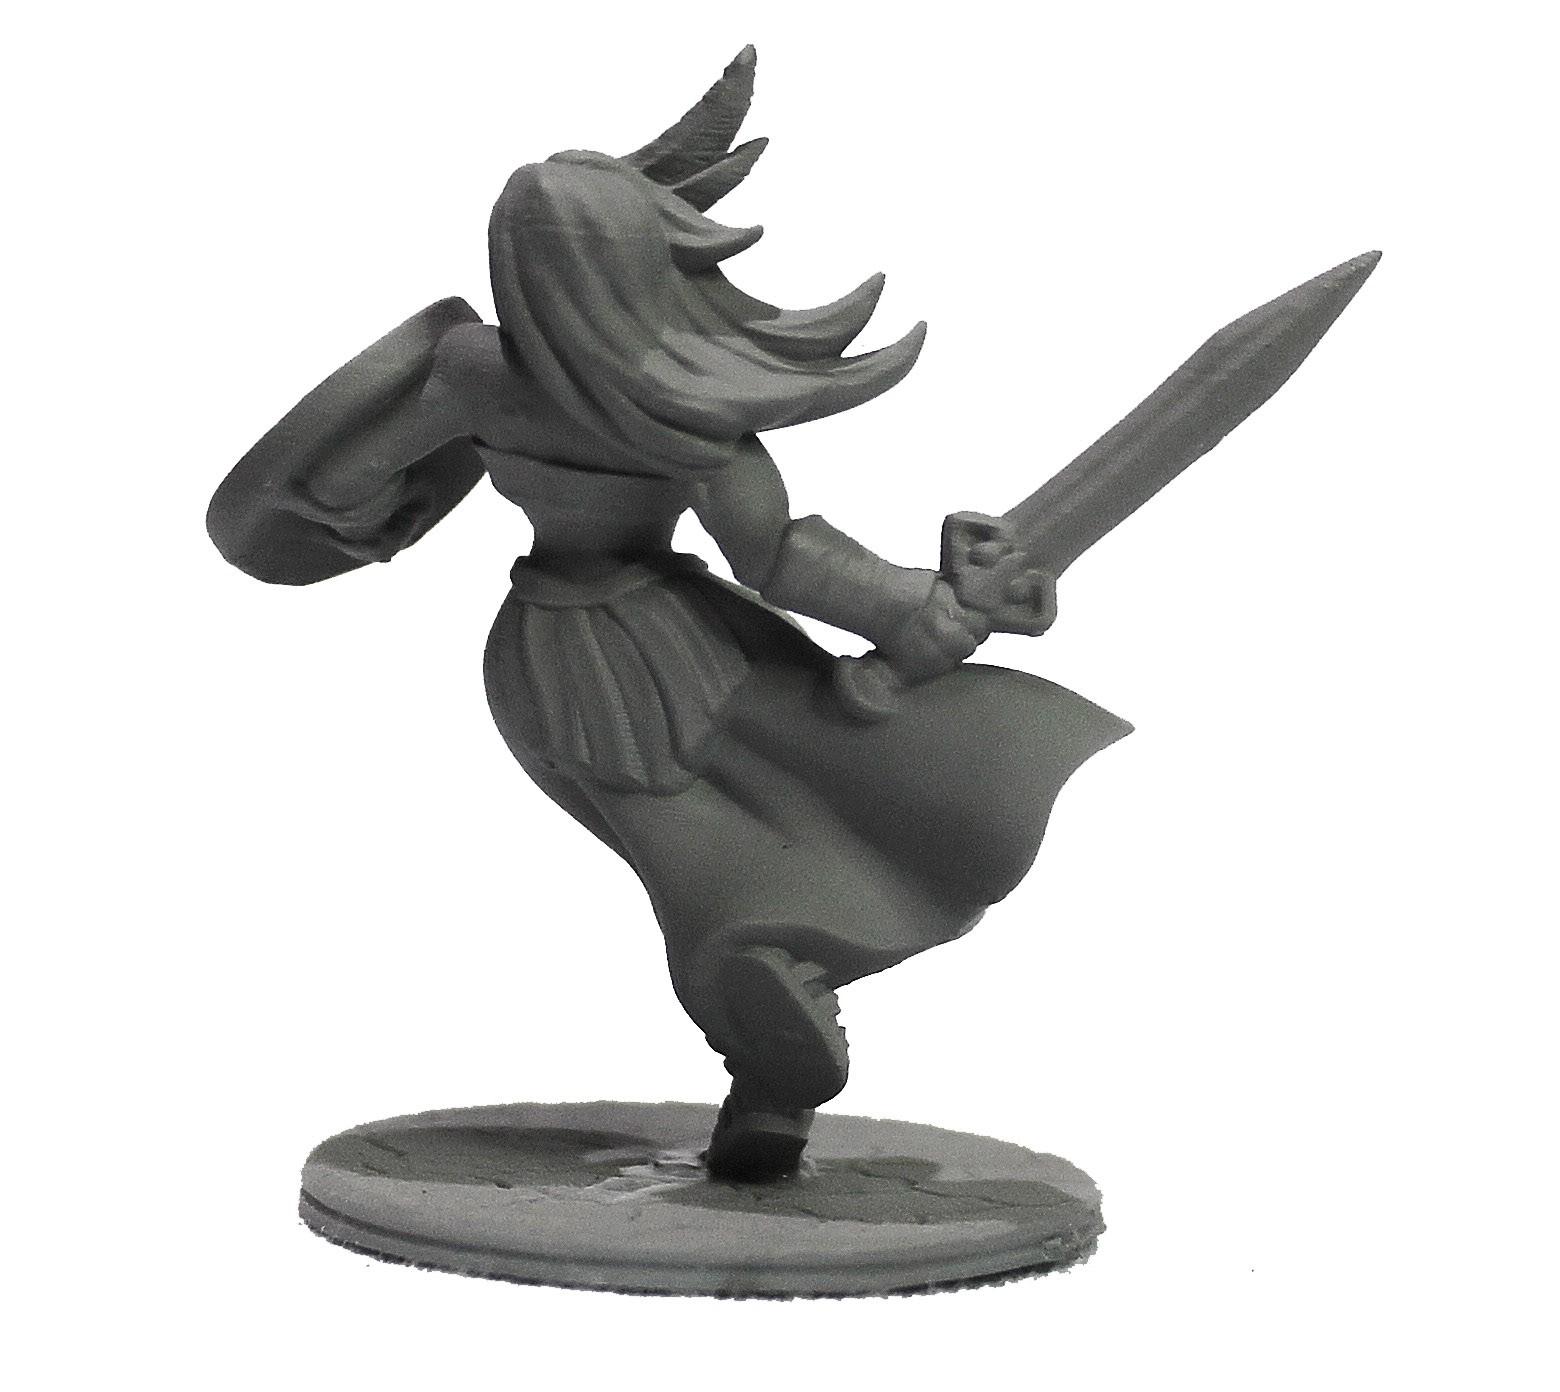 Amazona miniatura RPG Boargame Hobby pintura - guerreira  - Dragon Store